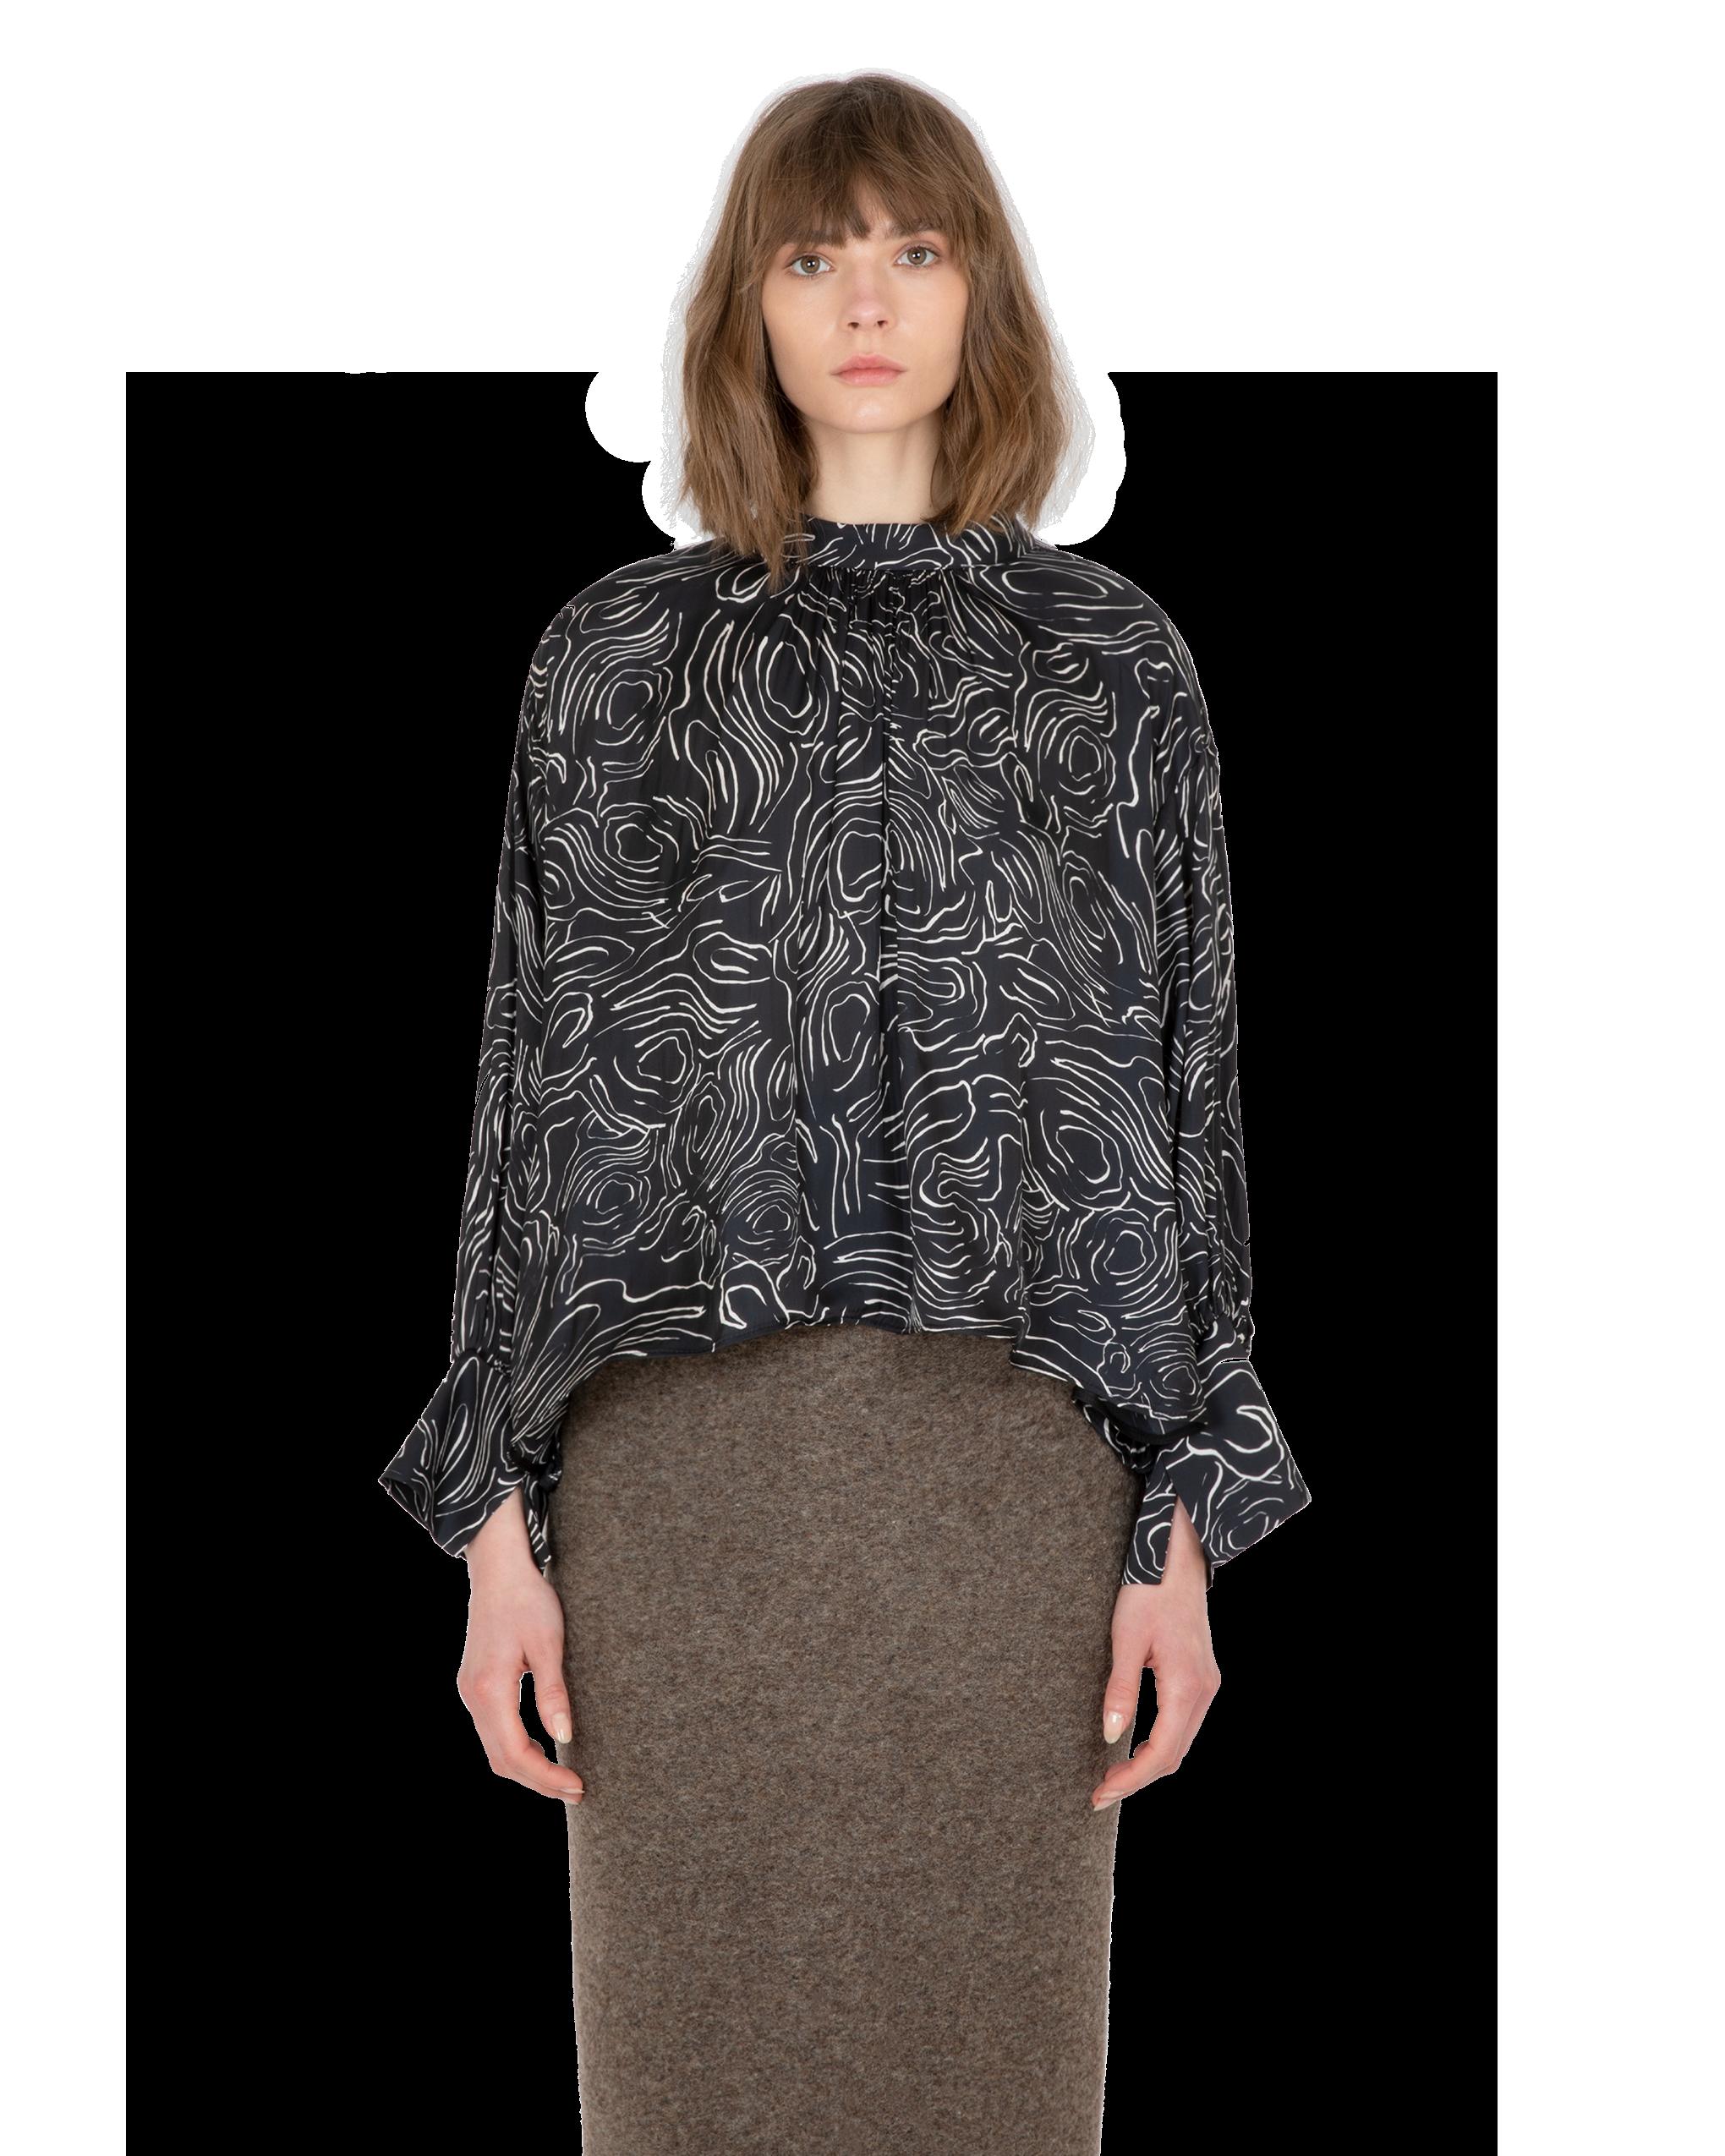 Model wearing EMIN + PAUL black volume blouse.